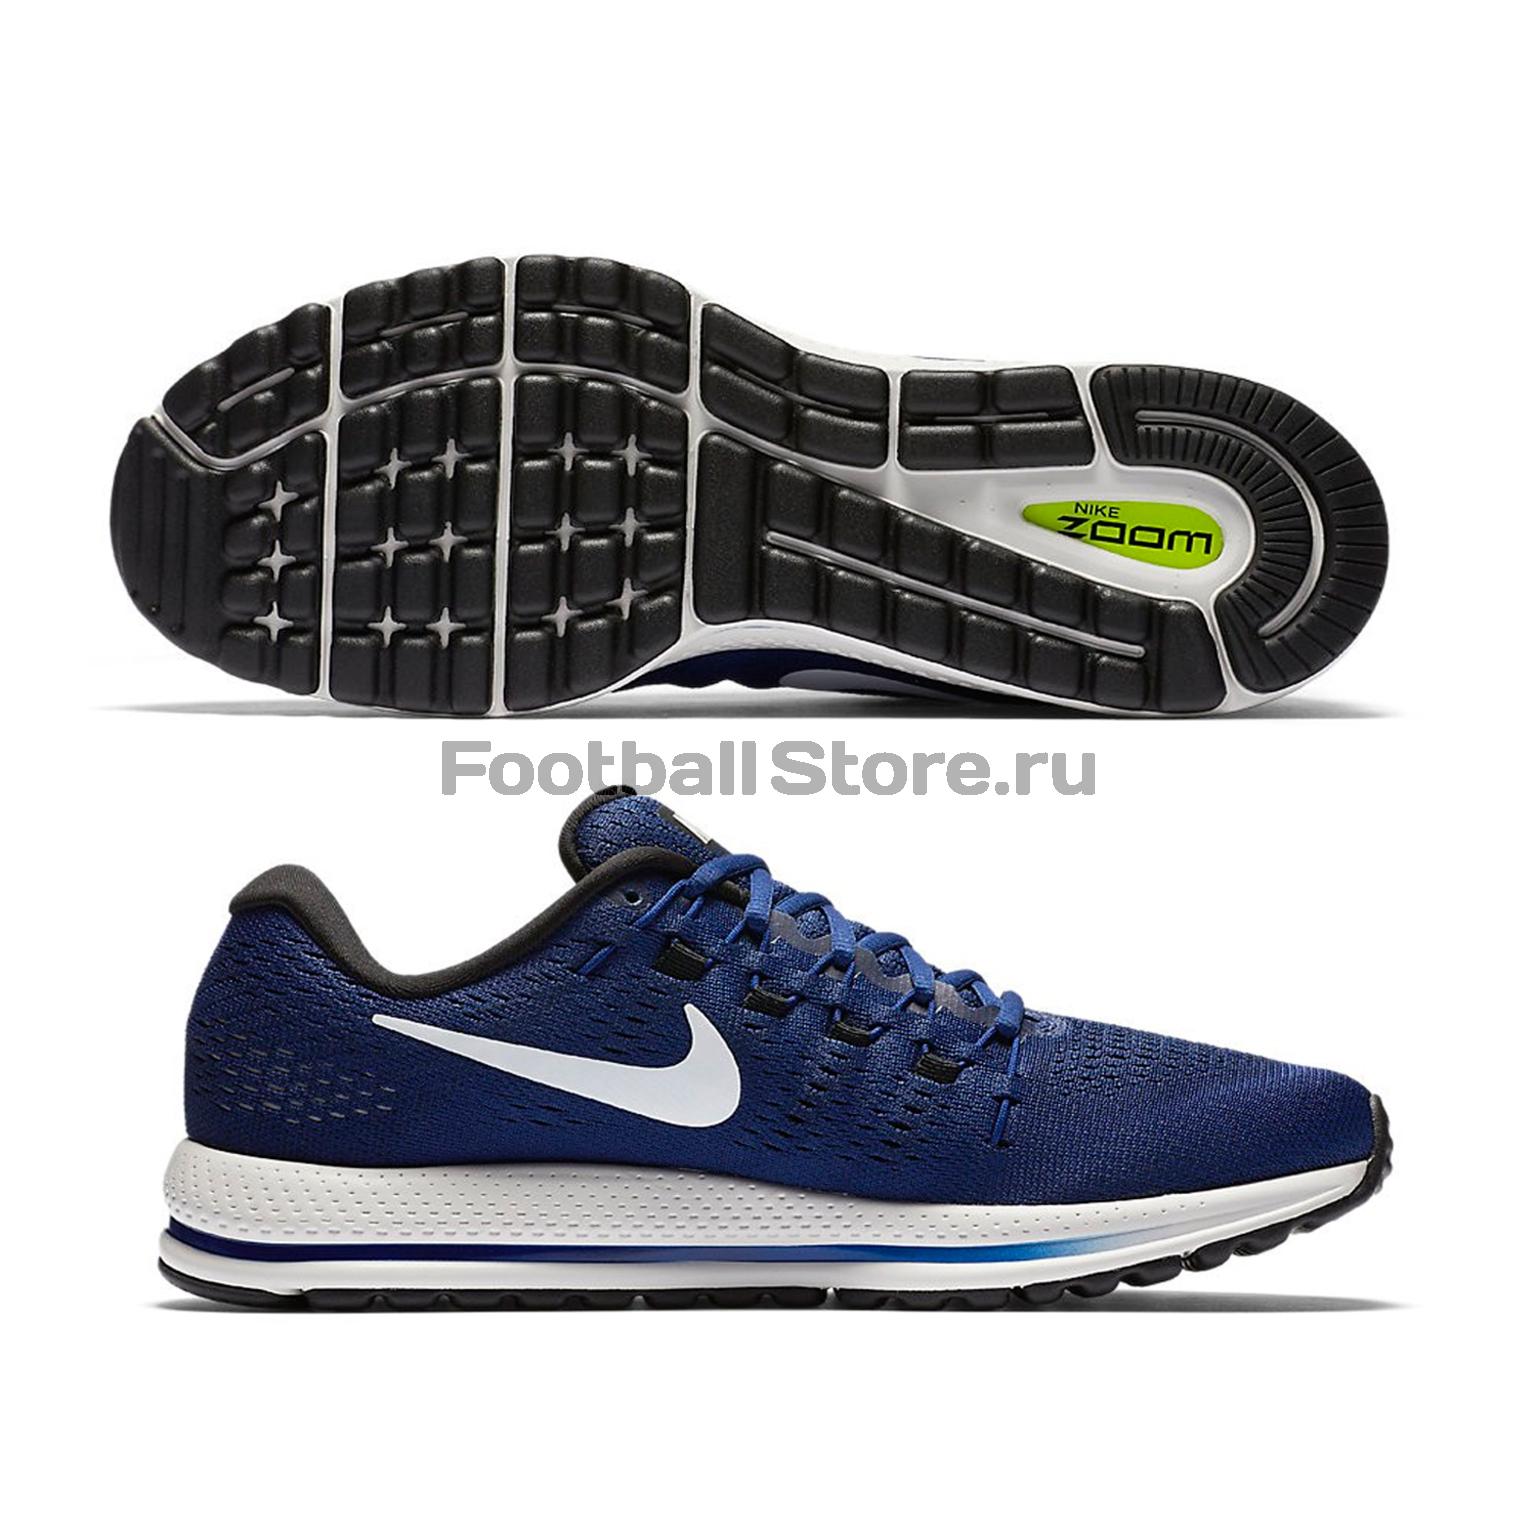 Кроссовки Nike Кроссовки Nike Air Zoom Vomero 12 863762-401